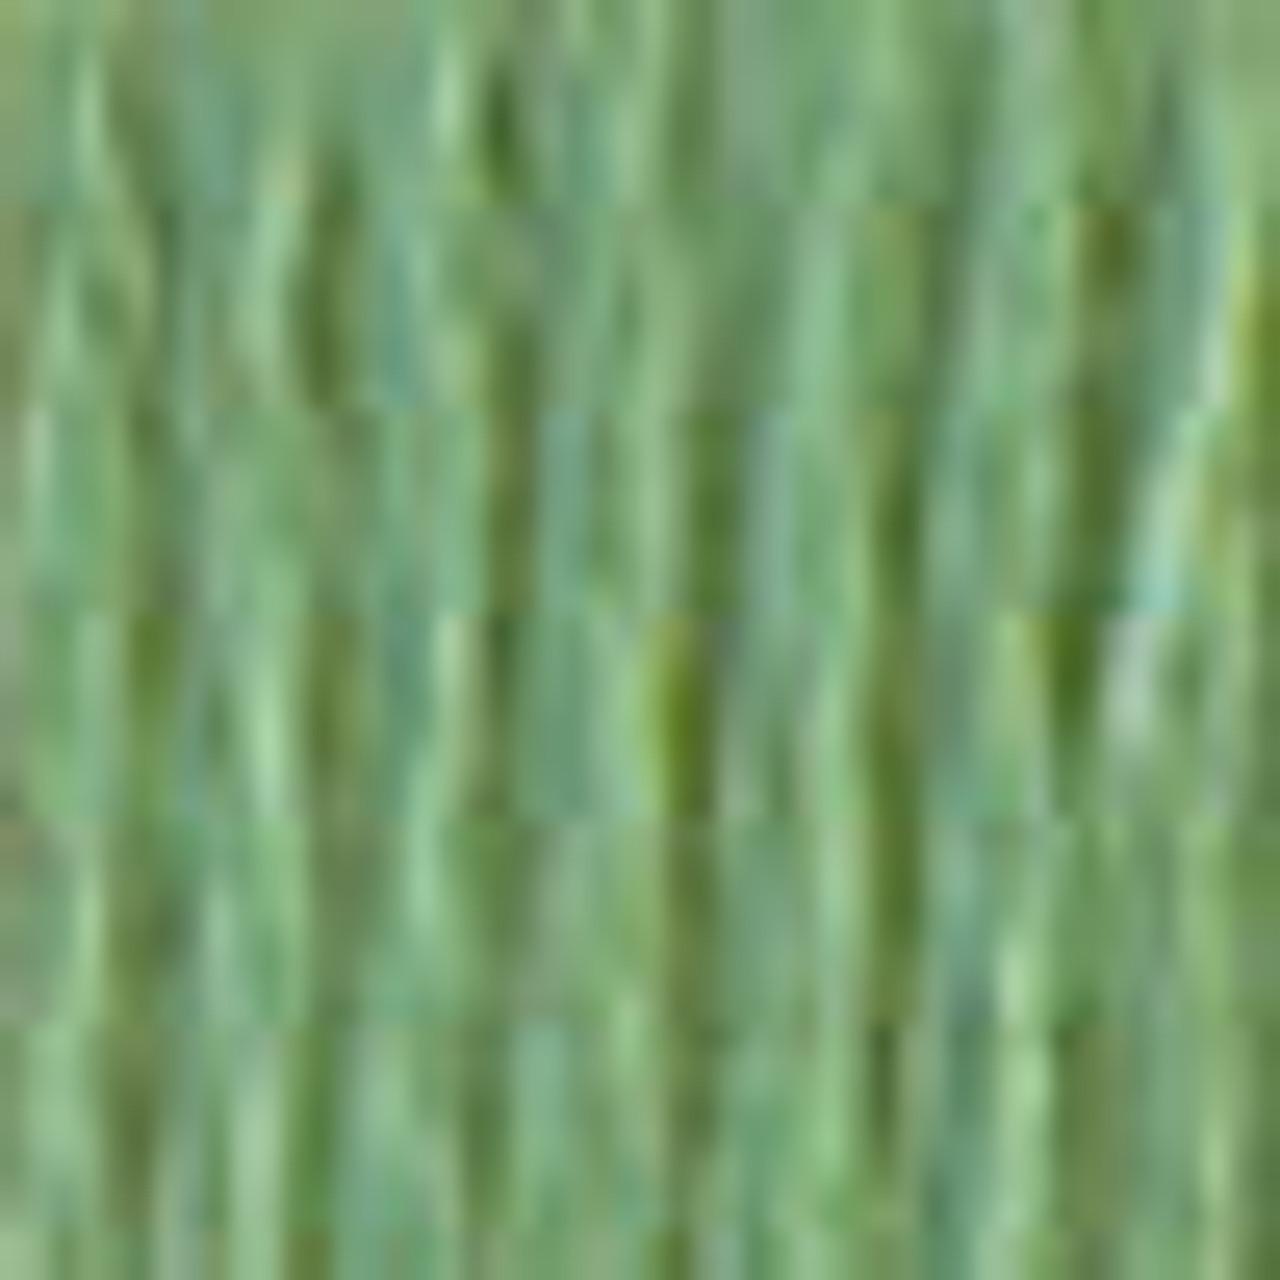 DMC # 3364 Pine Green Floss / Thread